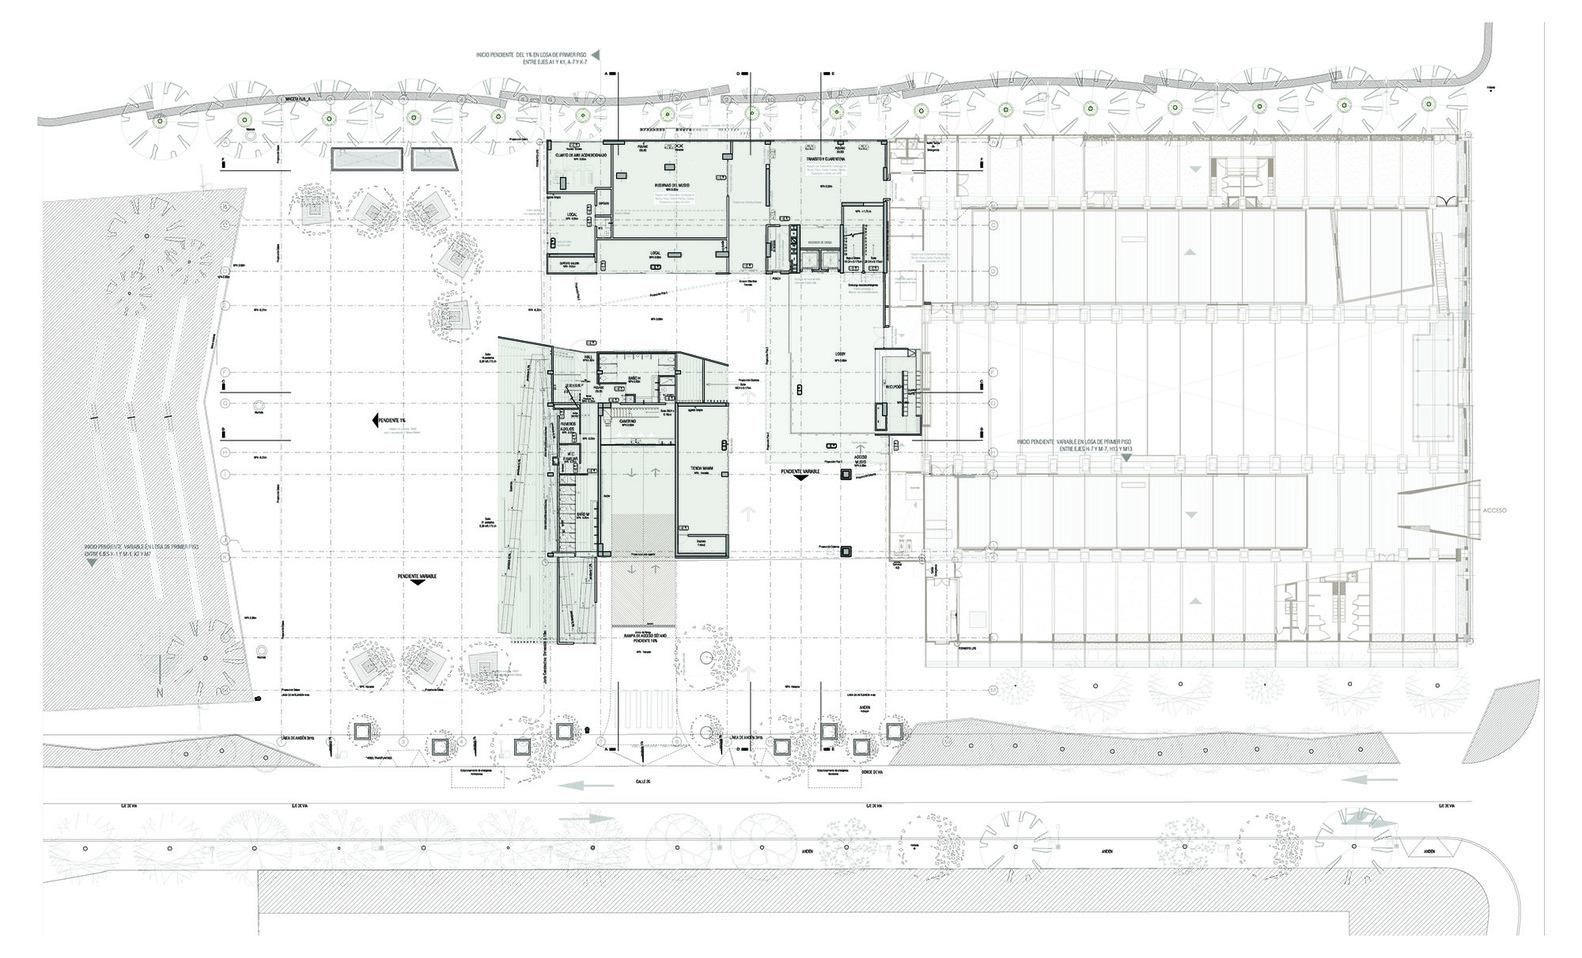 Modern art museum of medellín extension ctrl g 51 1 site plan